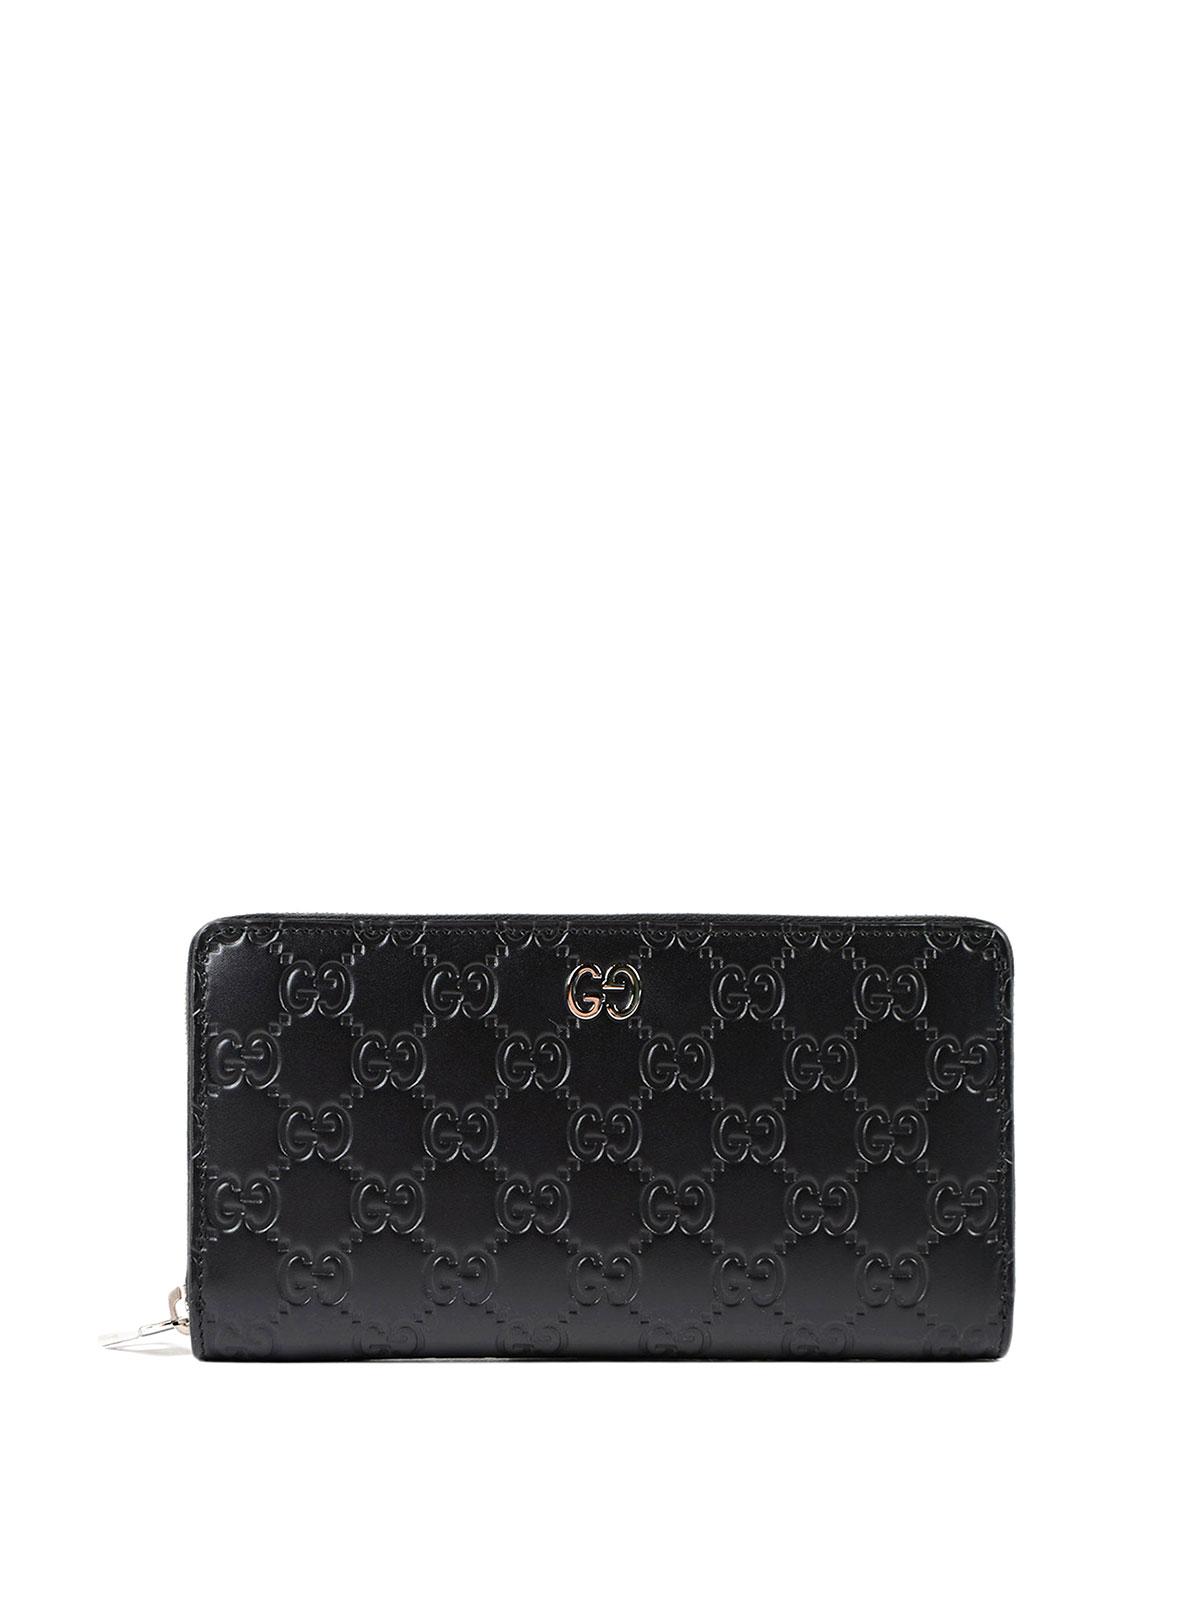 a4cade76ecdf Gucci - Gucci Signature zip-around wallet - wallets & purses ...